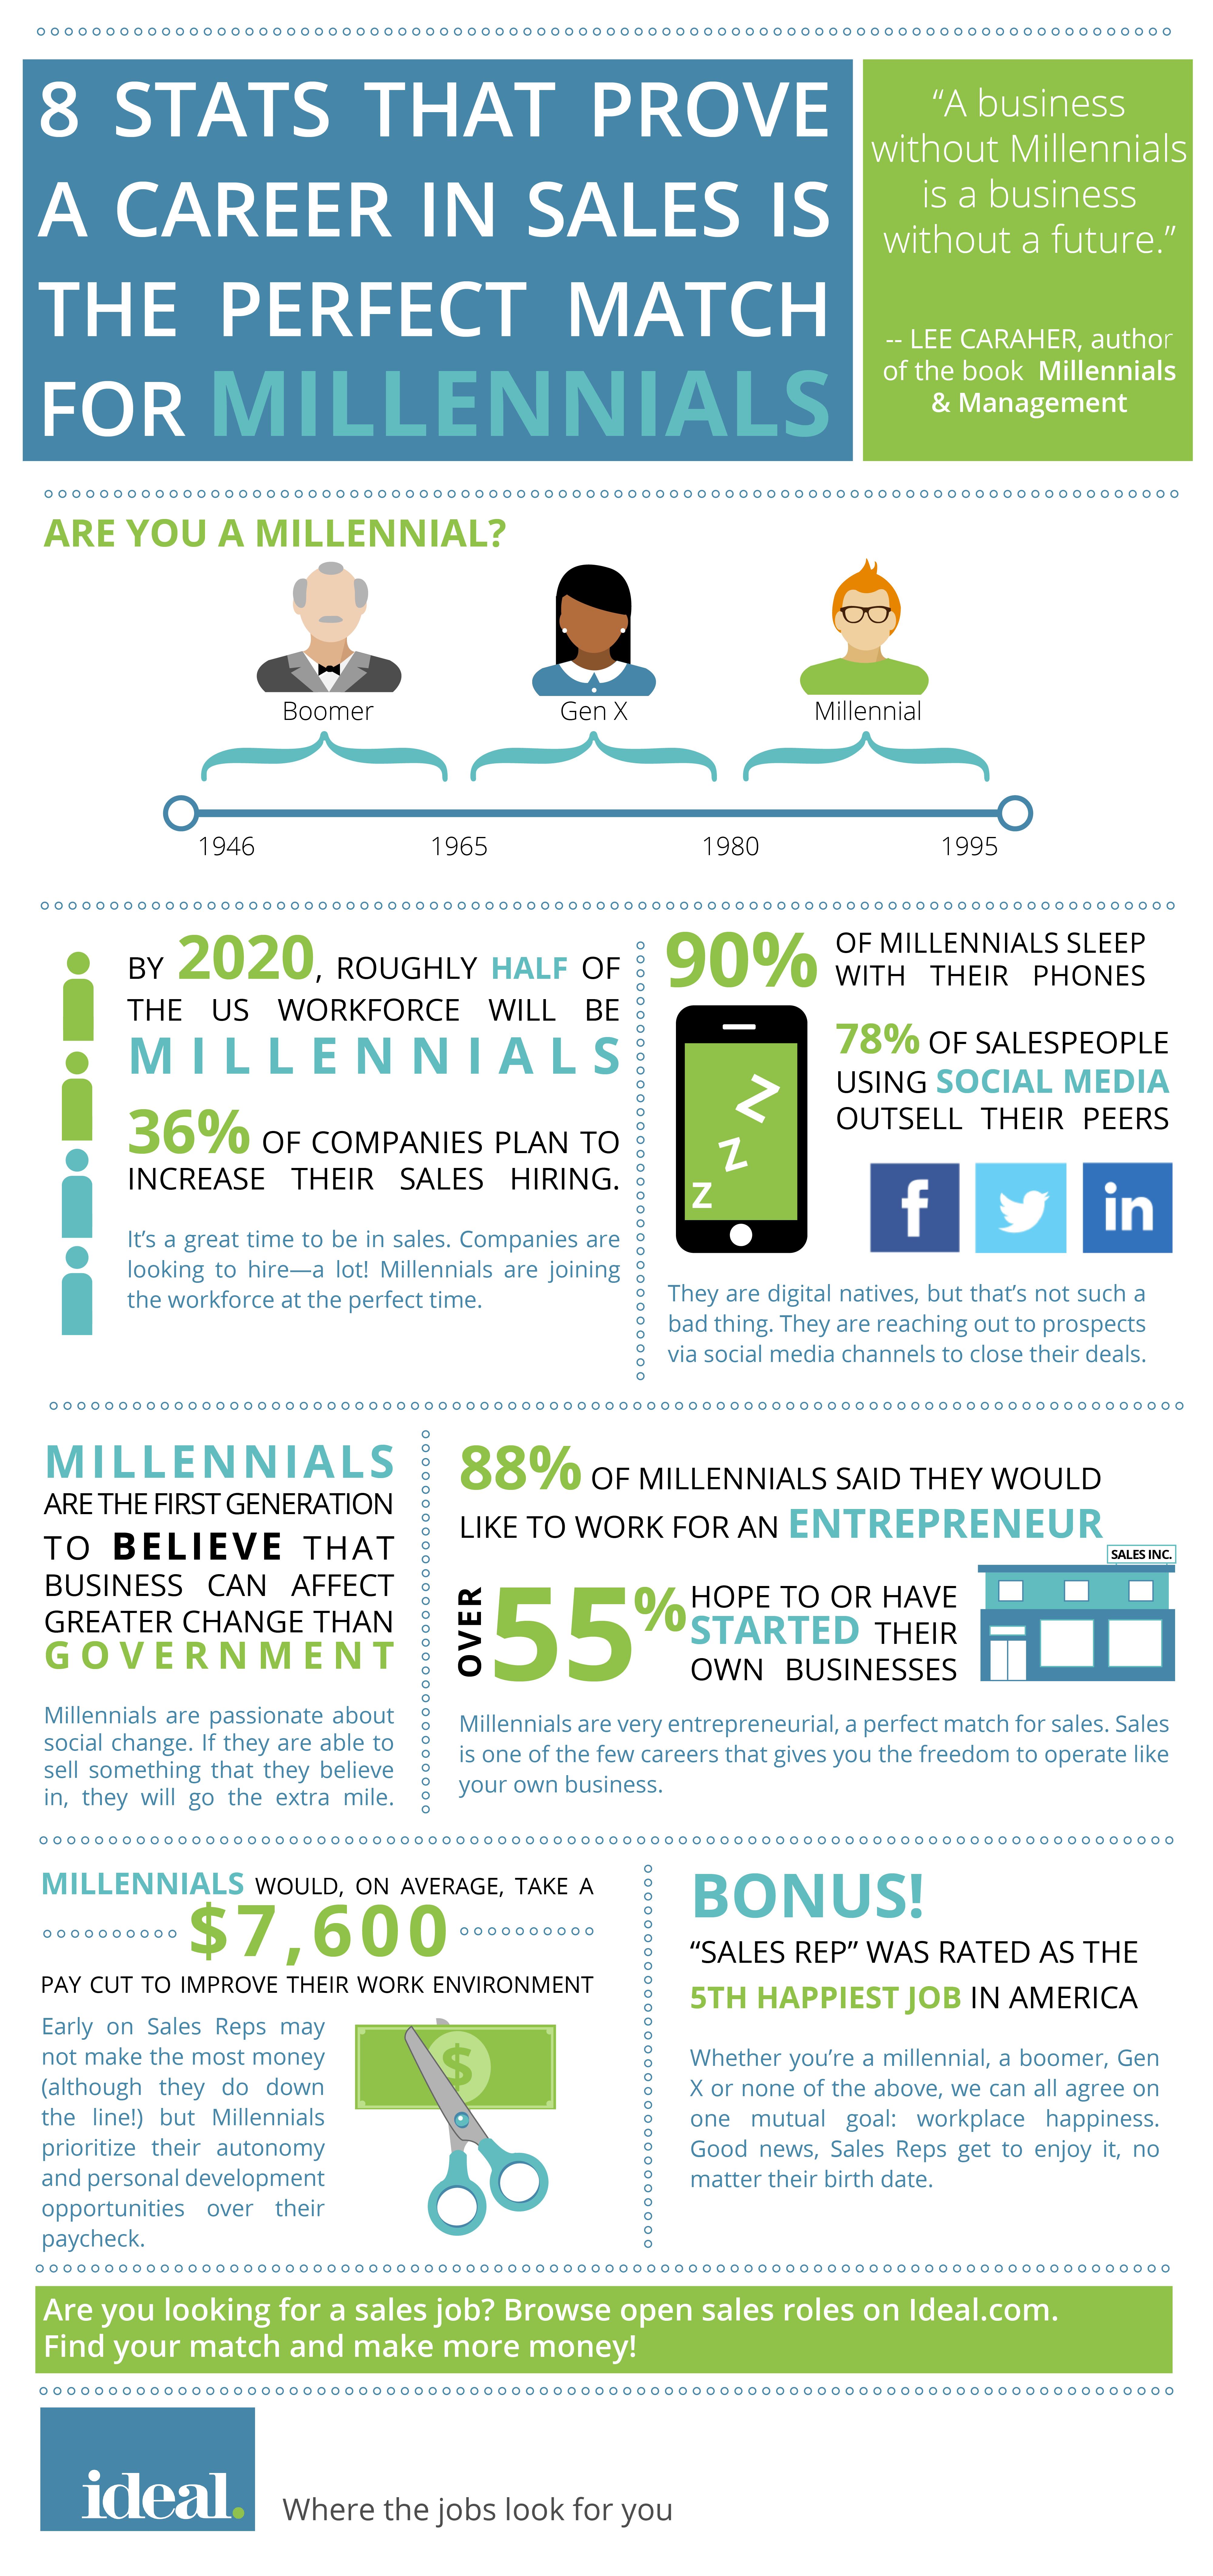 hubspot-ideal-infographic-millennials-and-sales.png